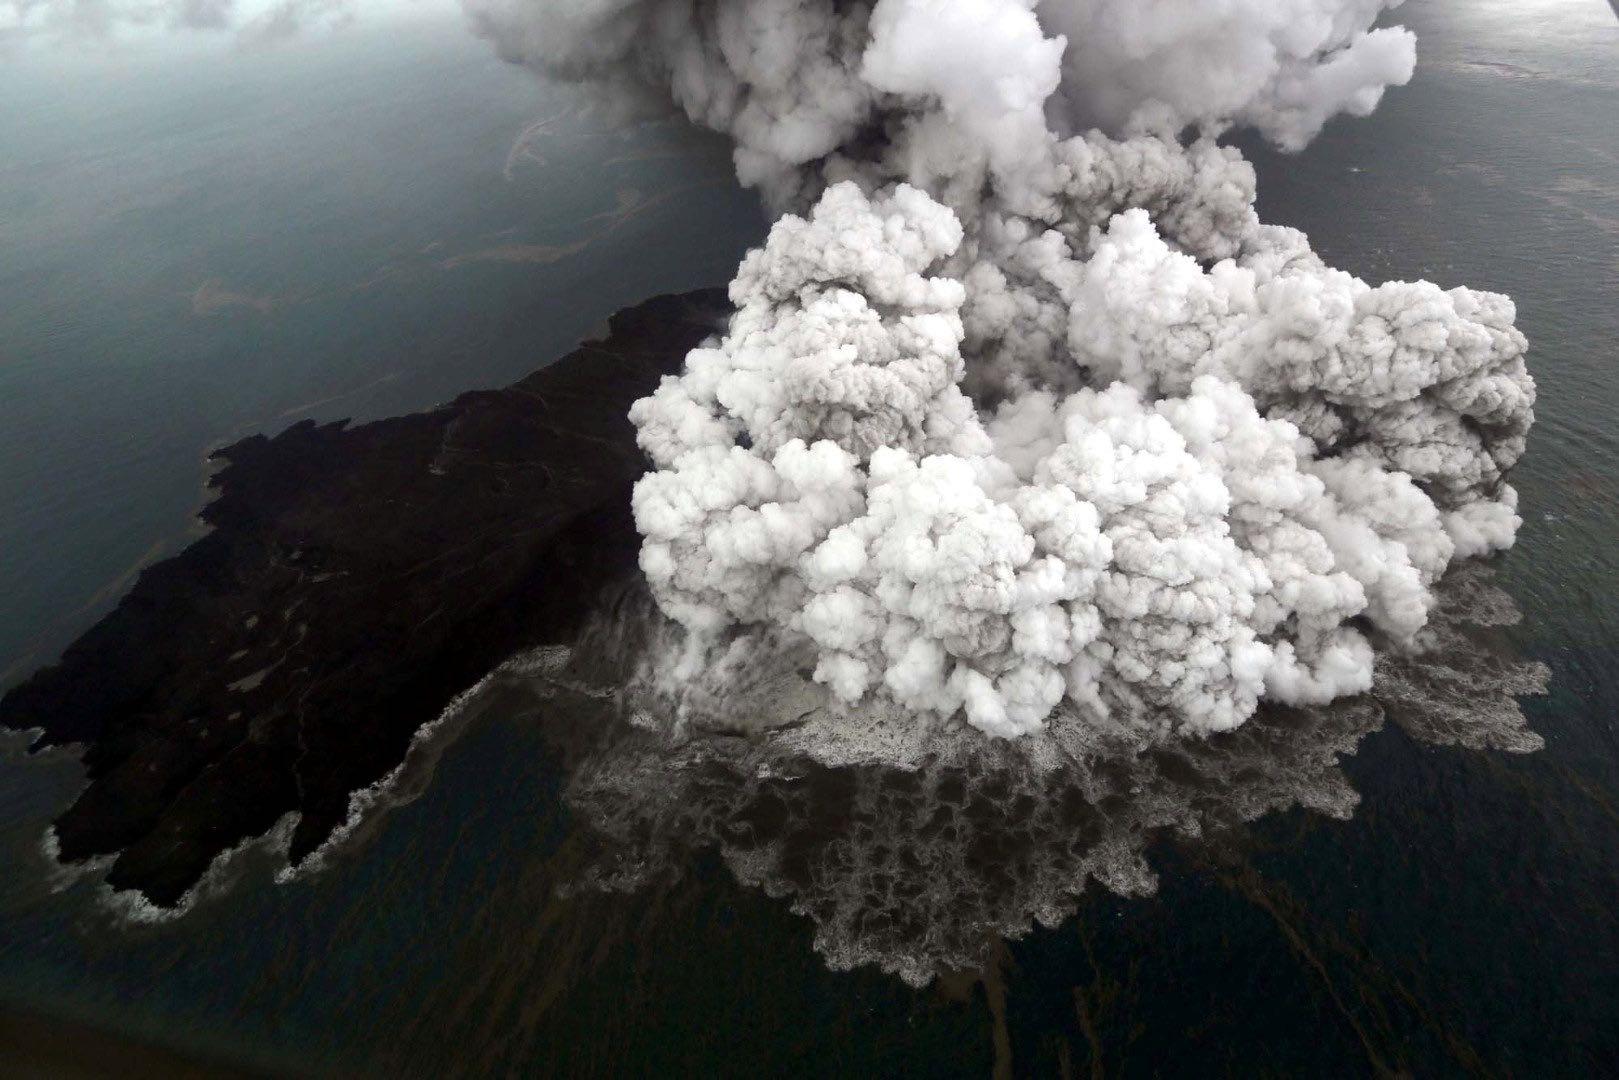 Video: Erupción del volcán Anak Krakatoa antes del tsunami